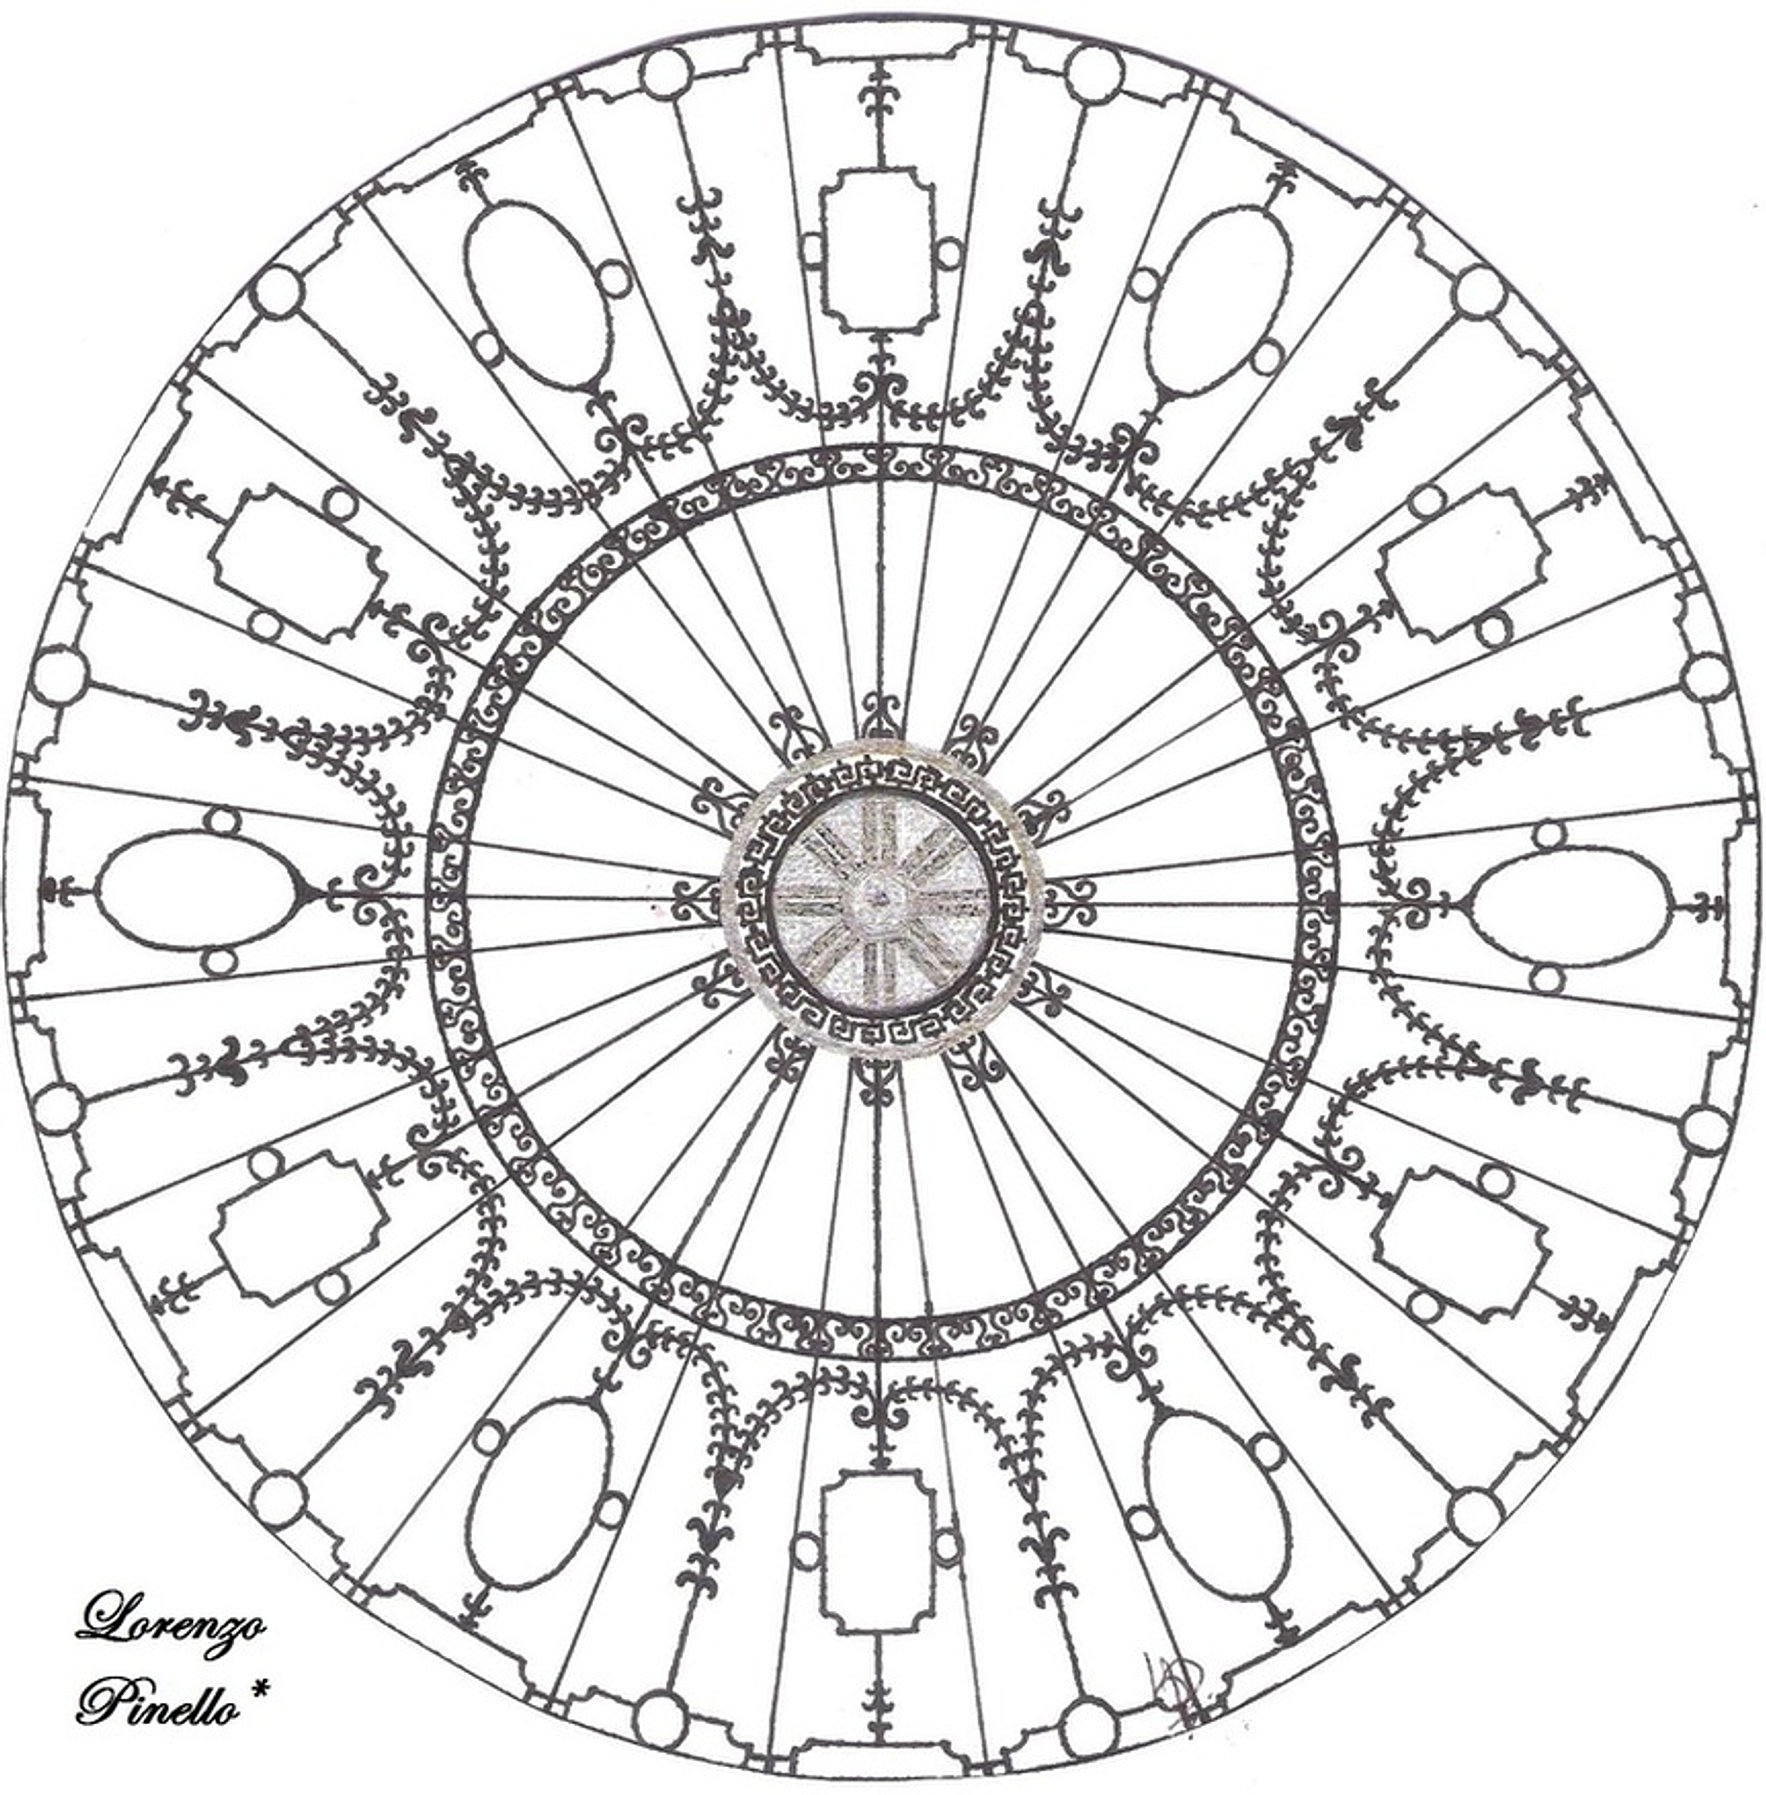 Lorenzopinello dessins du titanic - Dessin du titanic ...